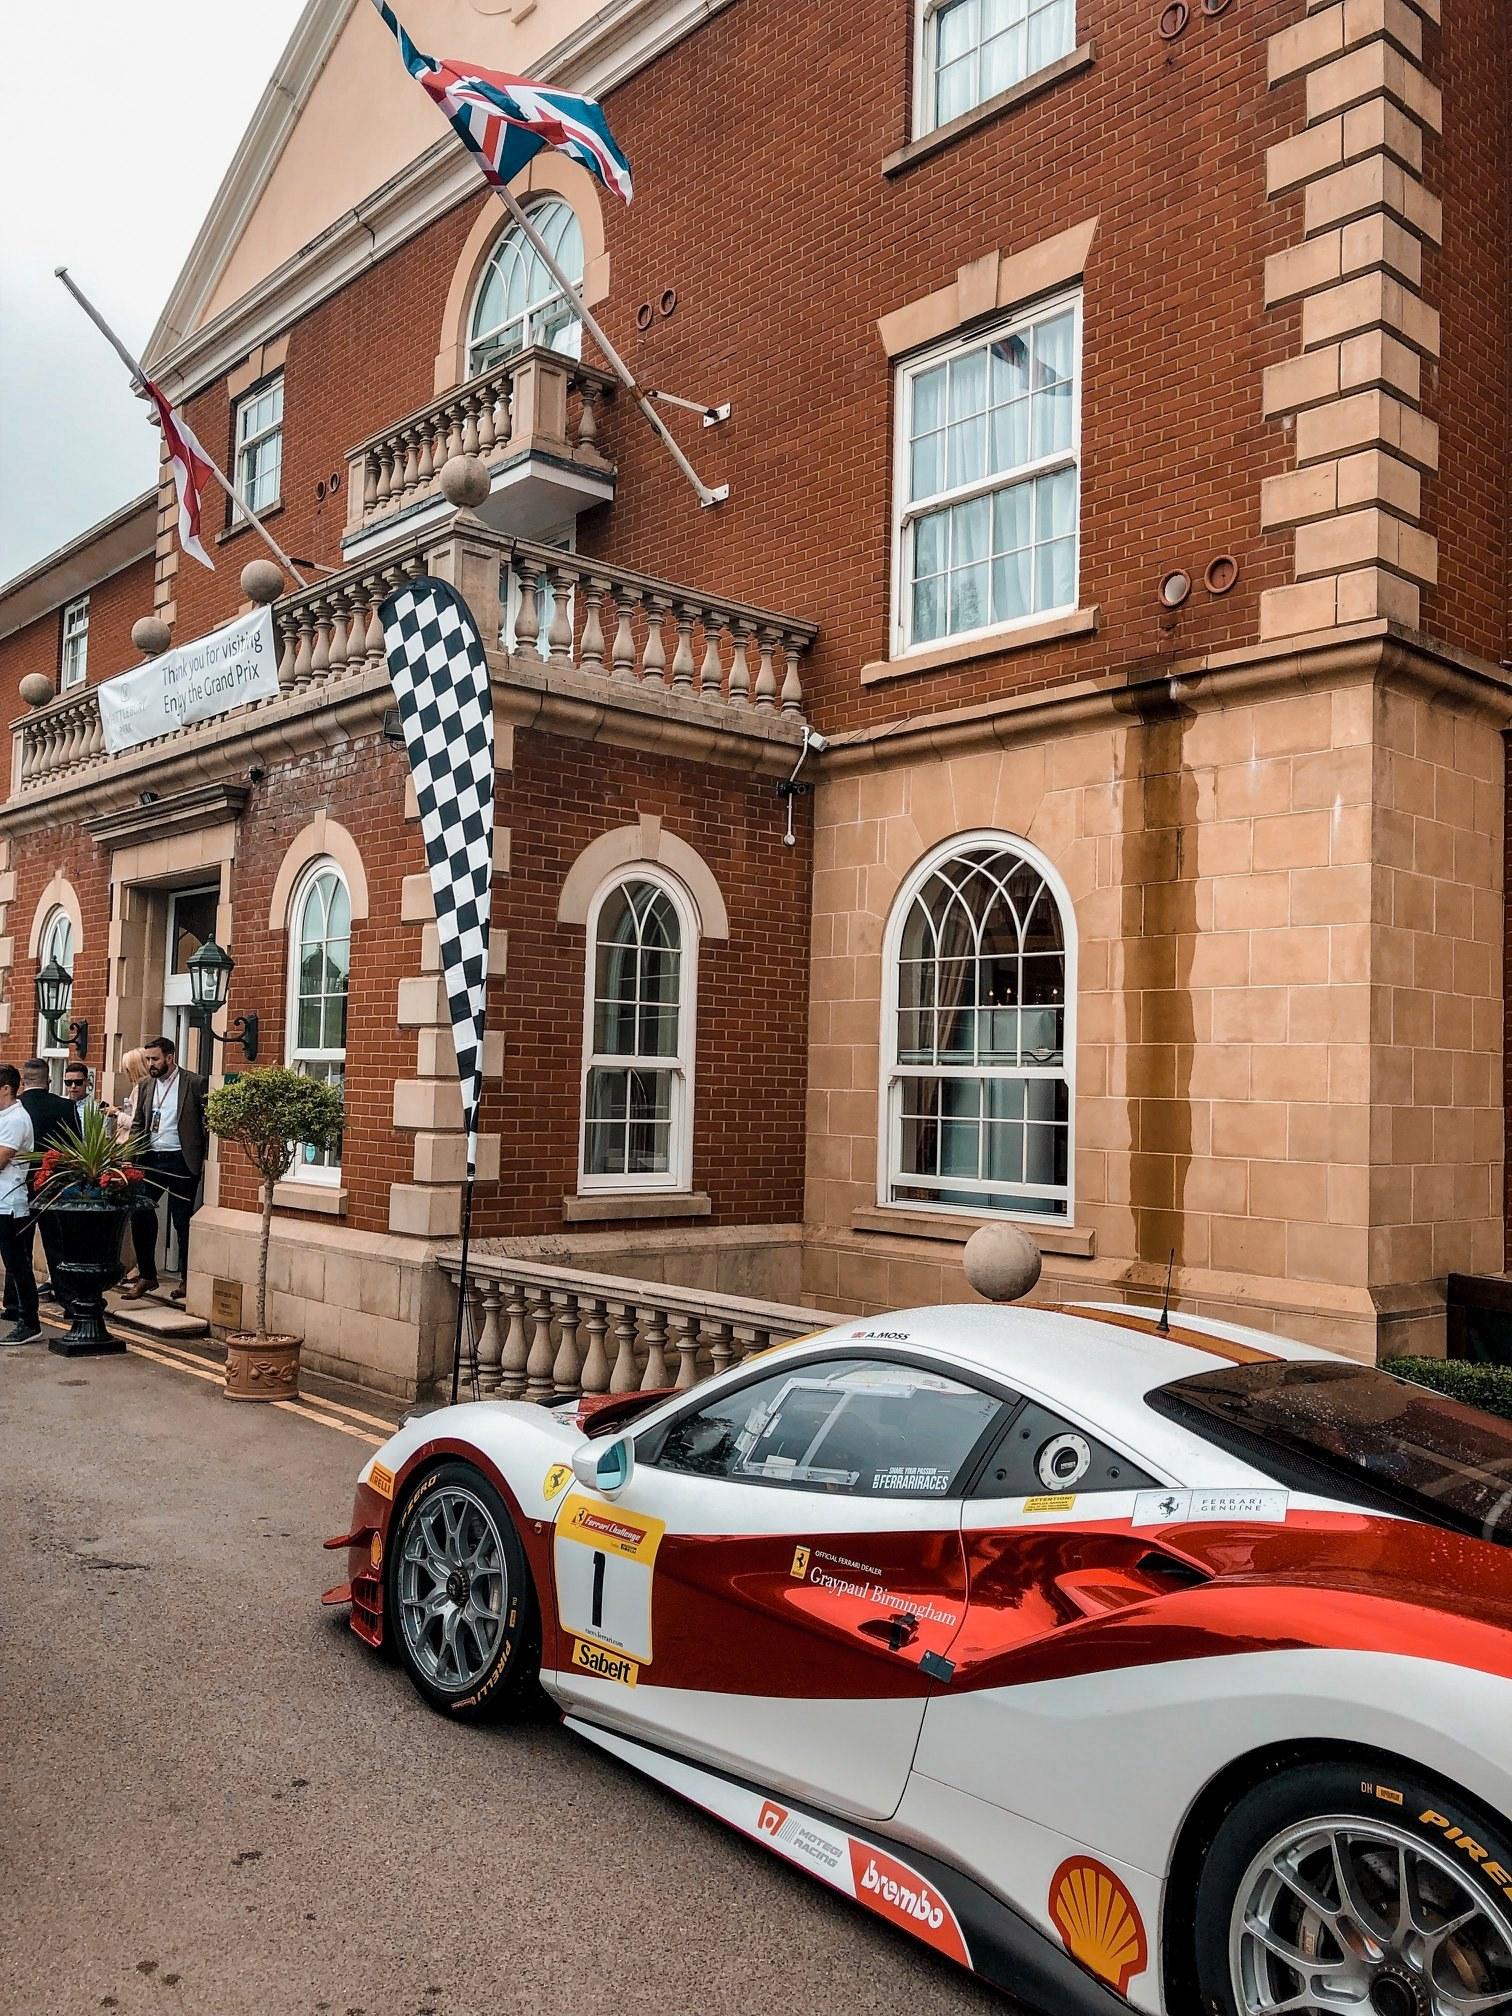 British Grand Prix | Nicole Navigates